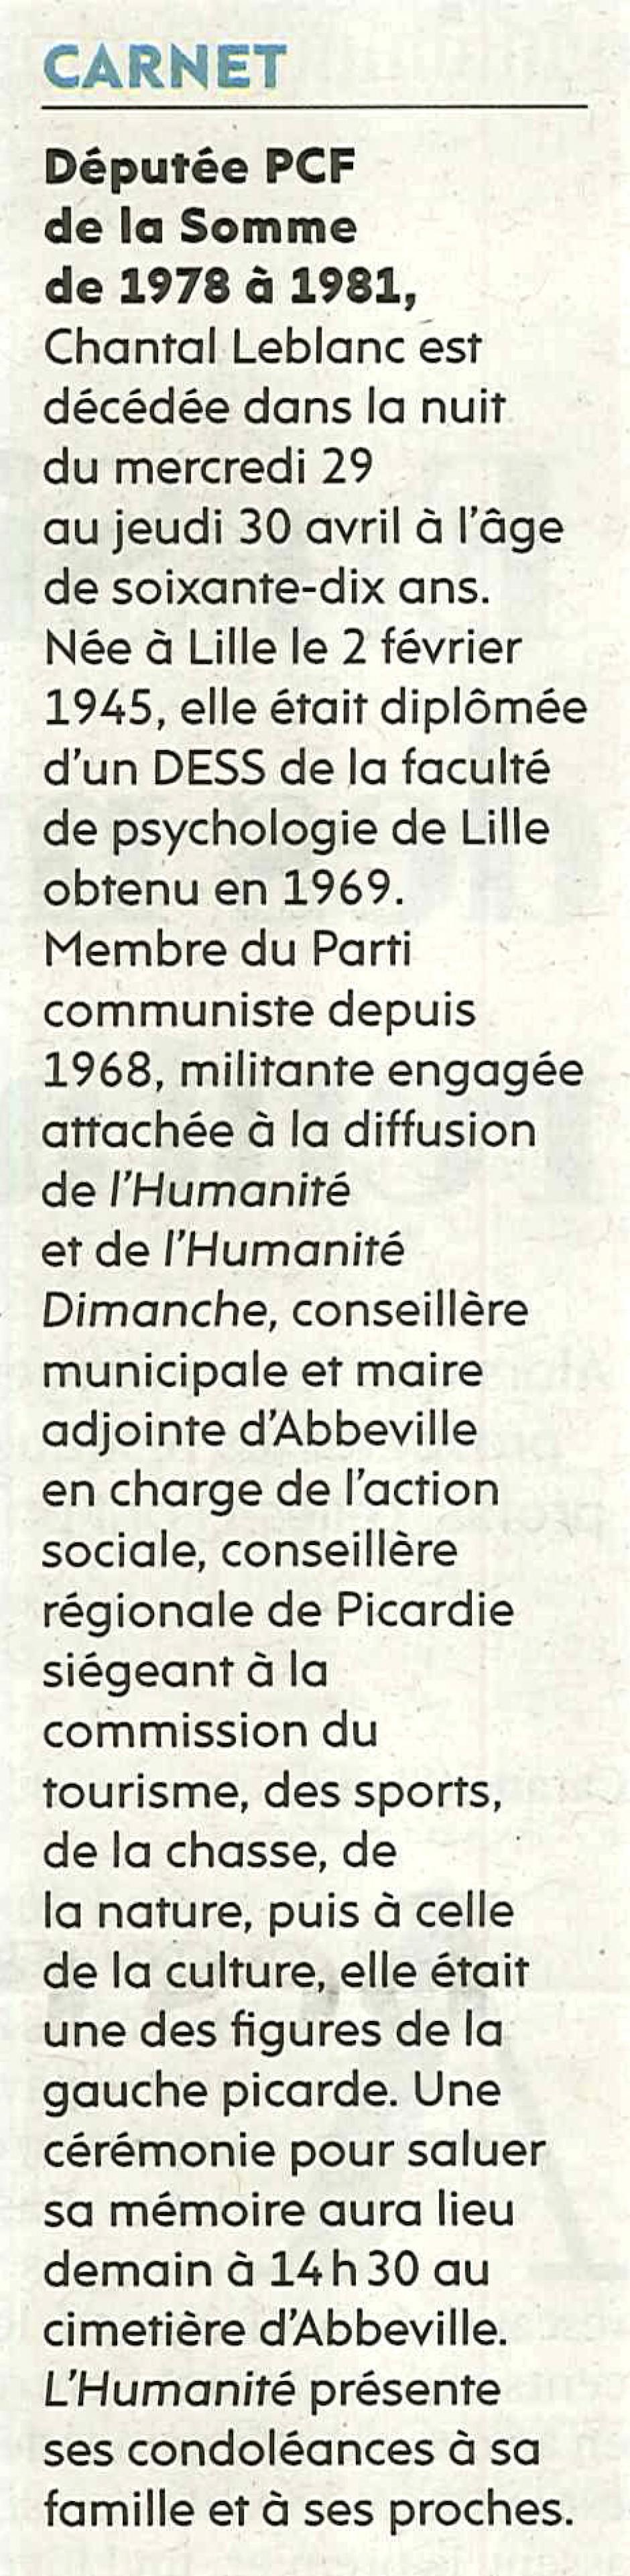 20150504-L'Huma-Abbeville-Carnet : Chantal Leblanc